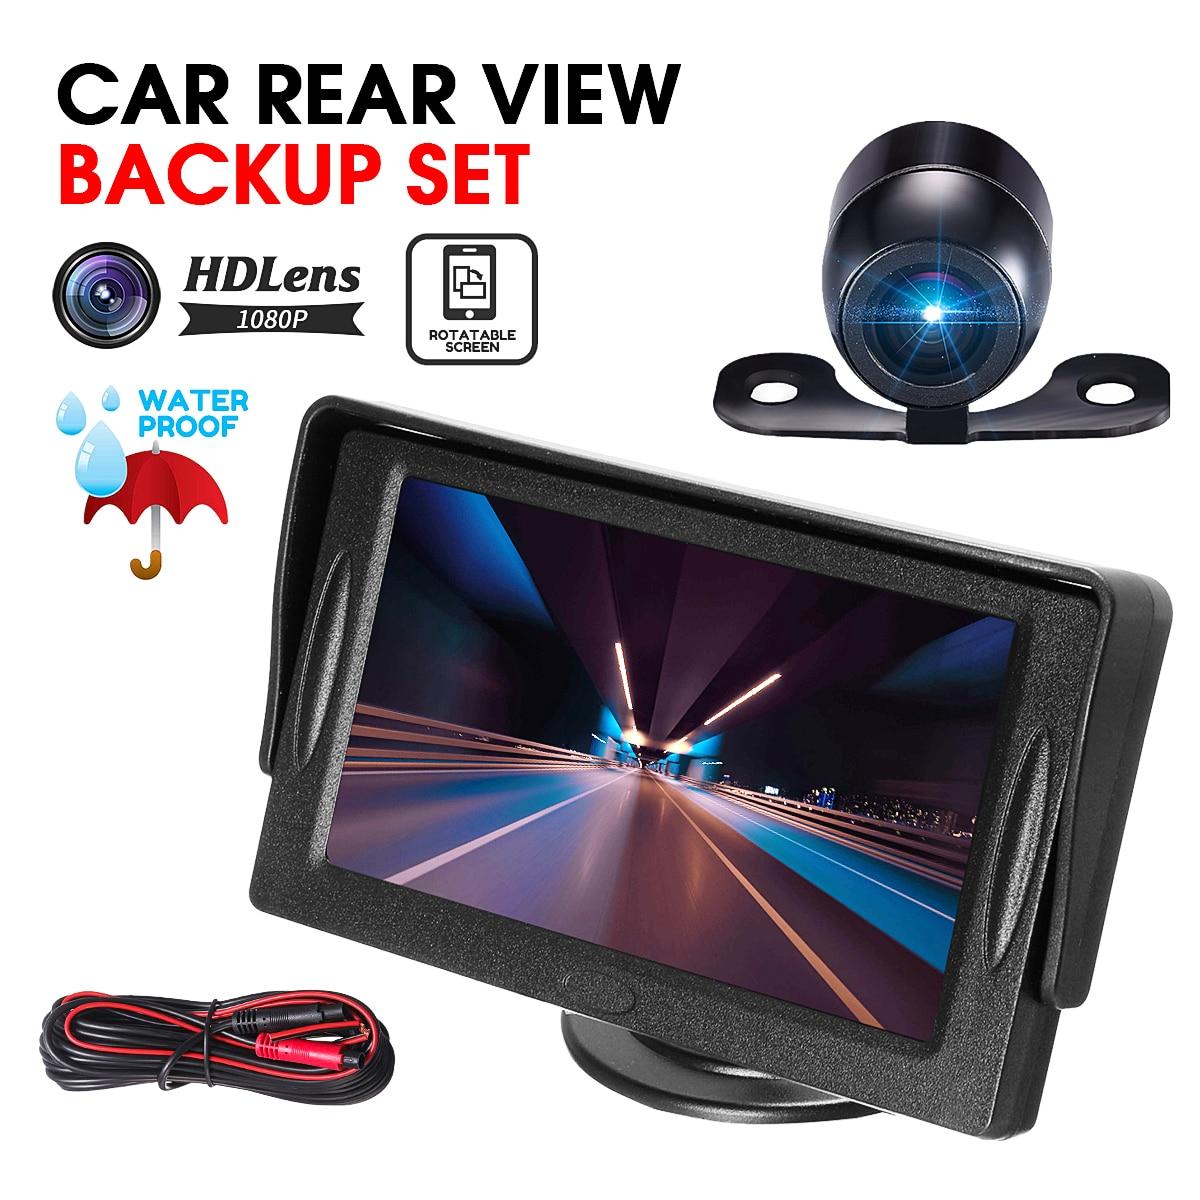 4,3 zoll TFT LCD Auto Monitor Sensor Spiegel System Parken Assistent Kamera DVD VCR Rückansicht Cam Kit für lkw